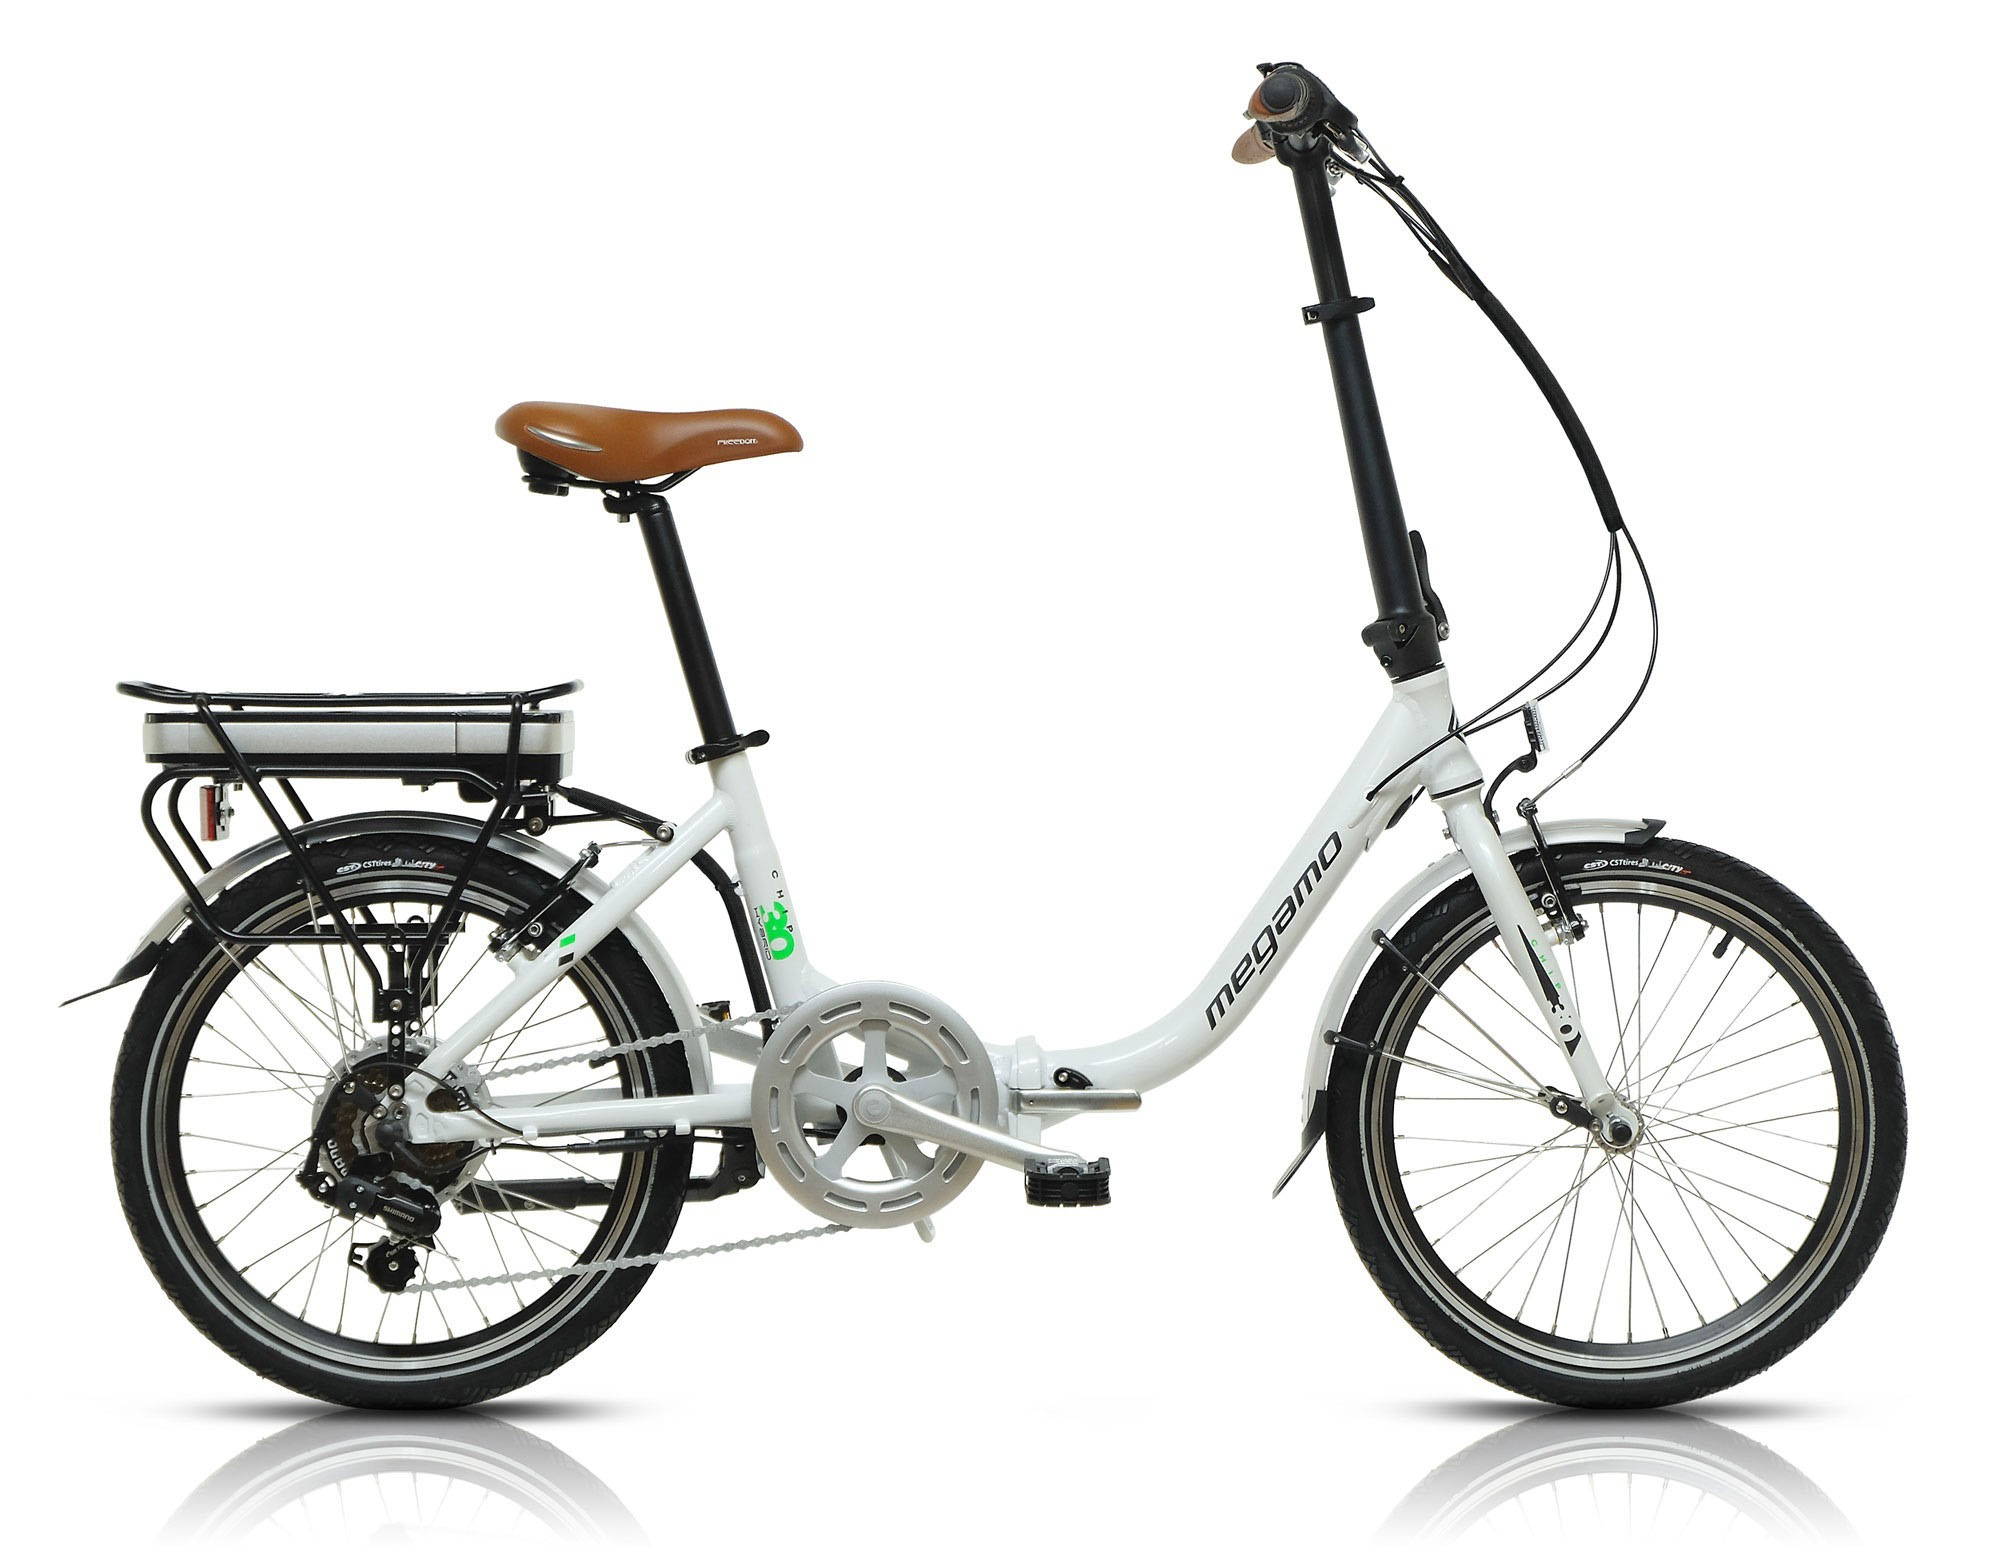 Bicicleta eléctrica Megamo Chip 3.0 2021